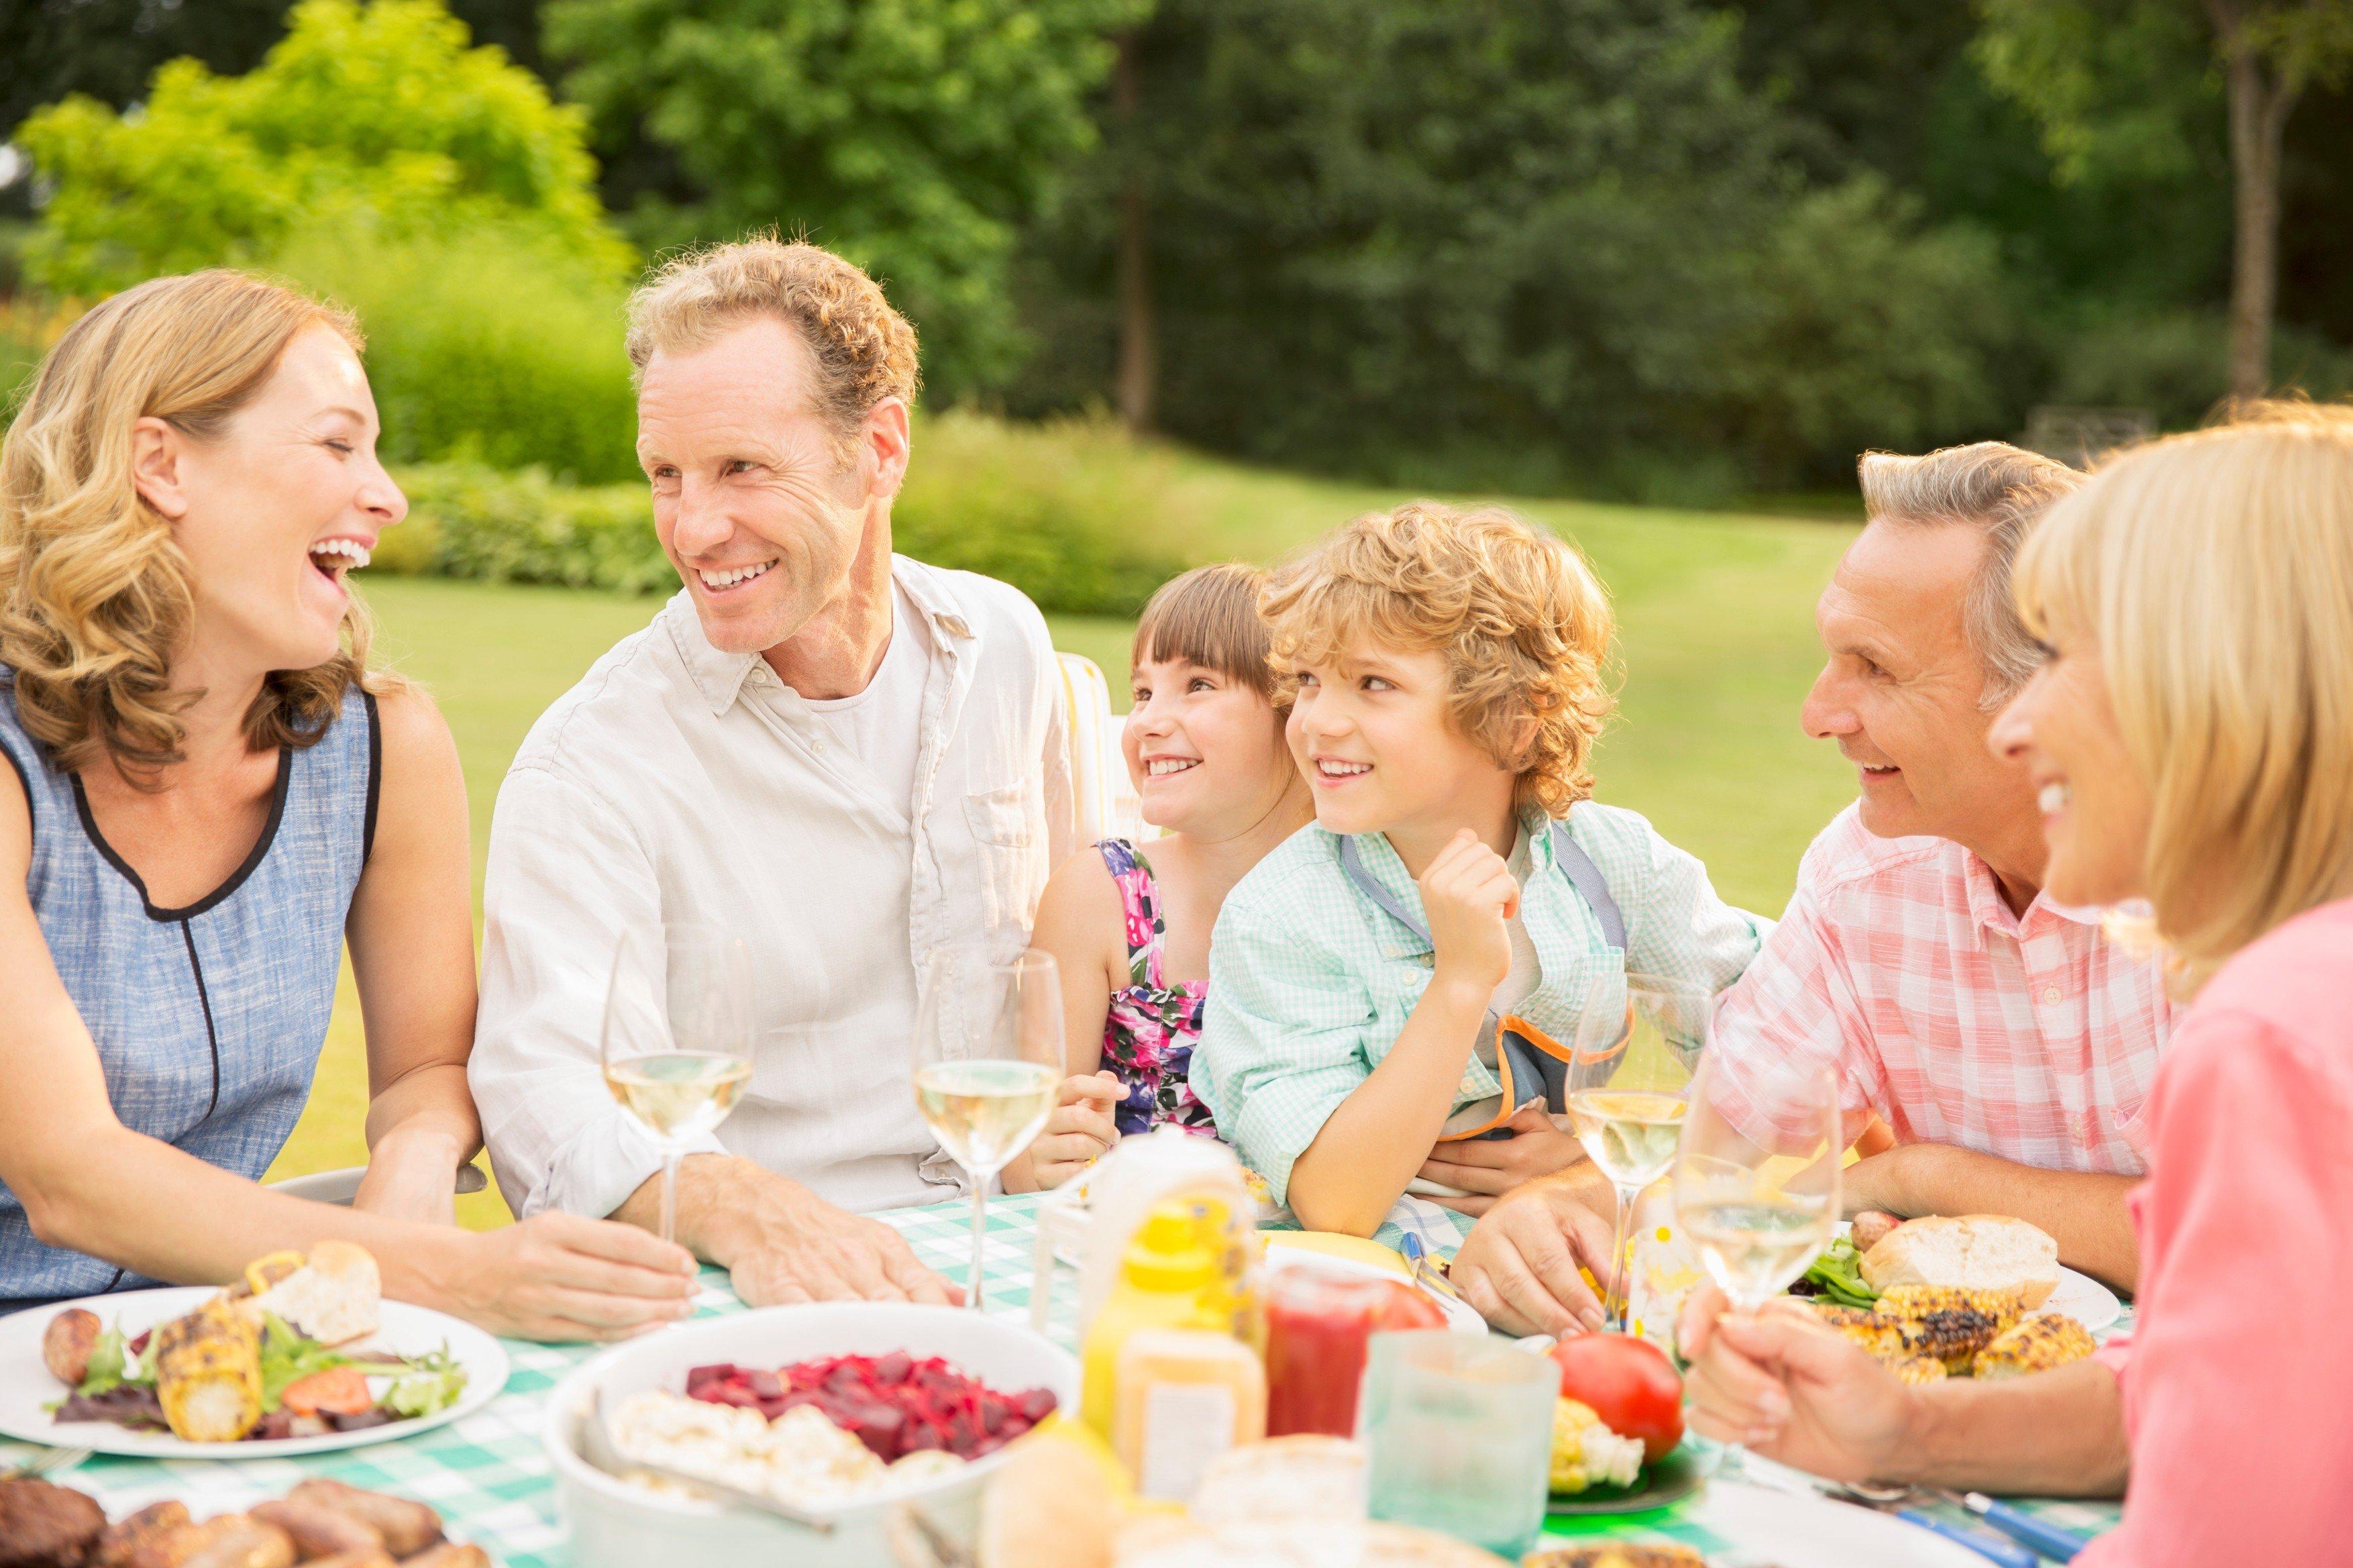 Rodinný oběd